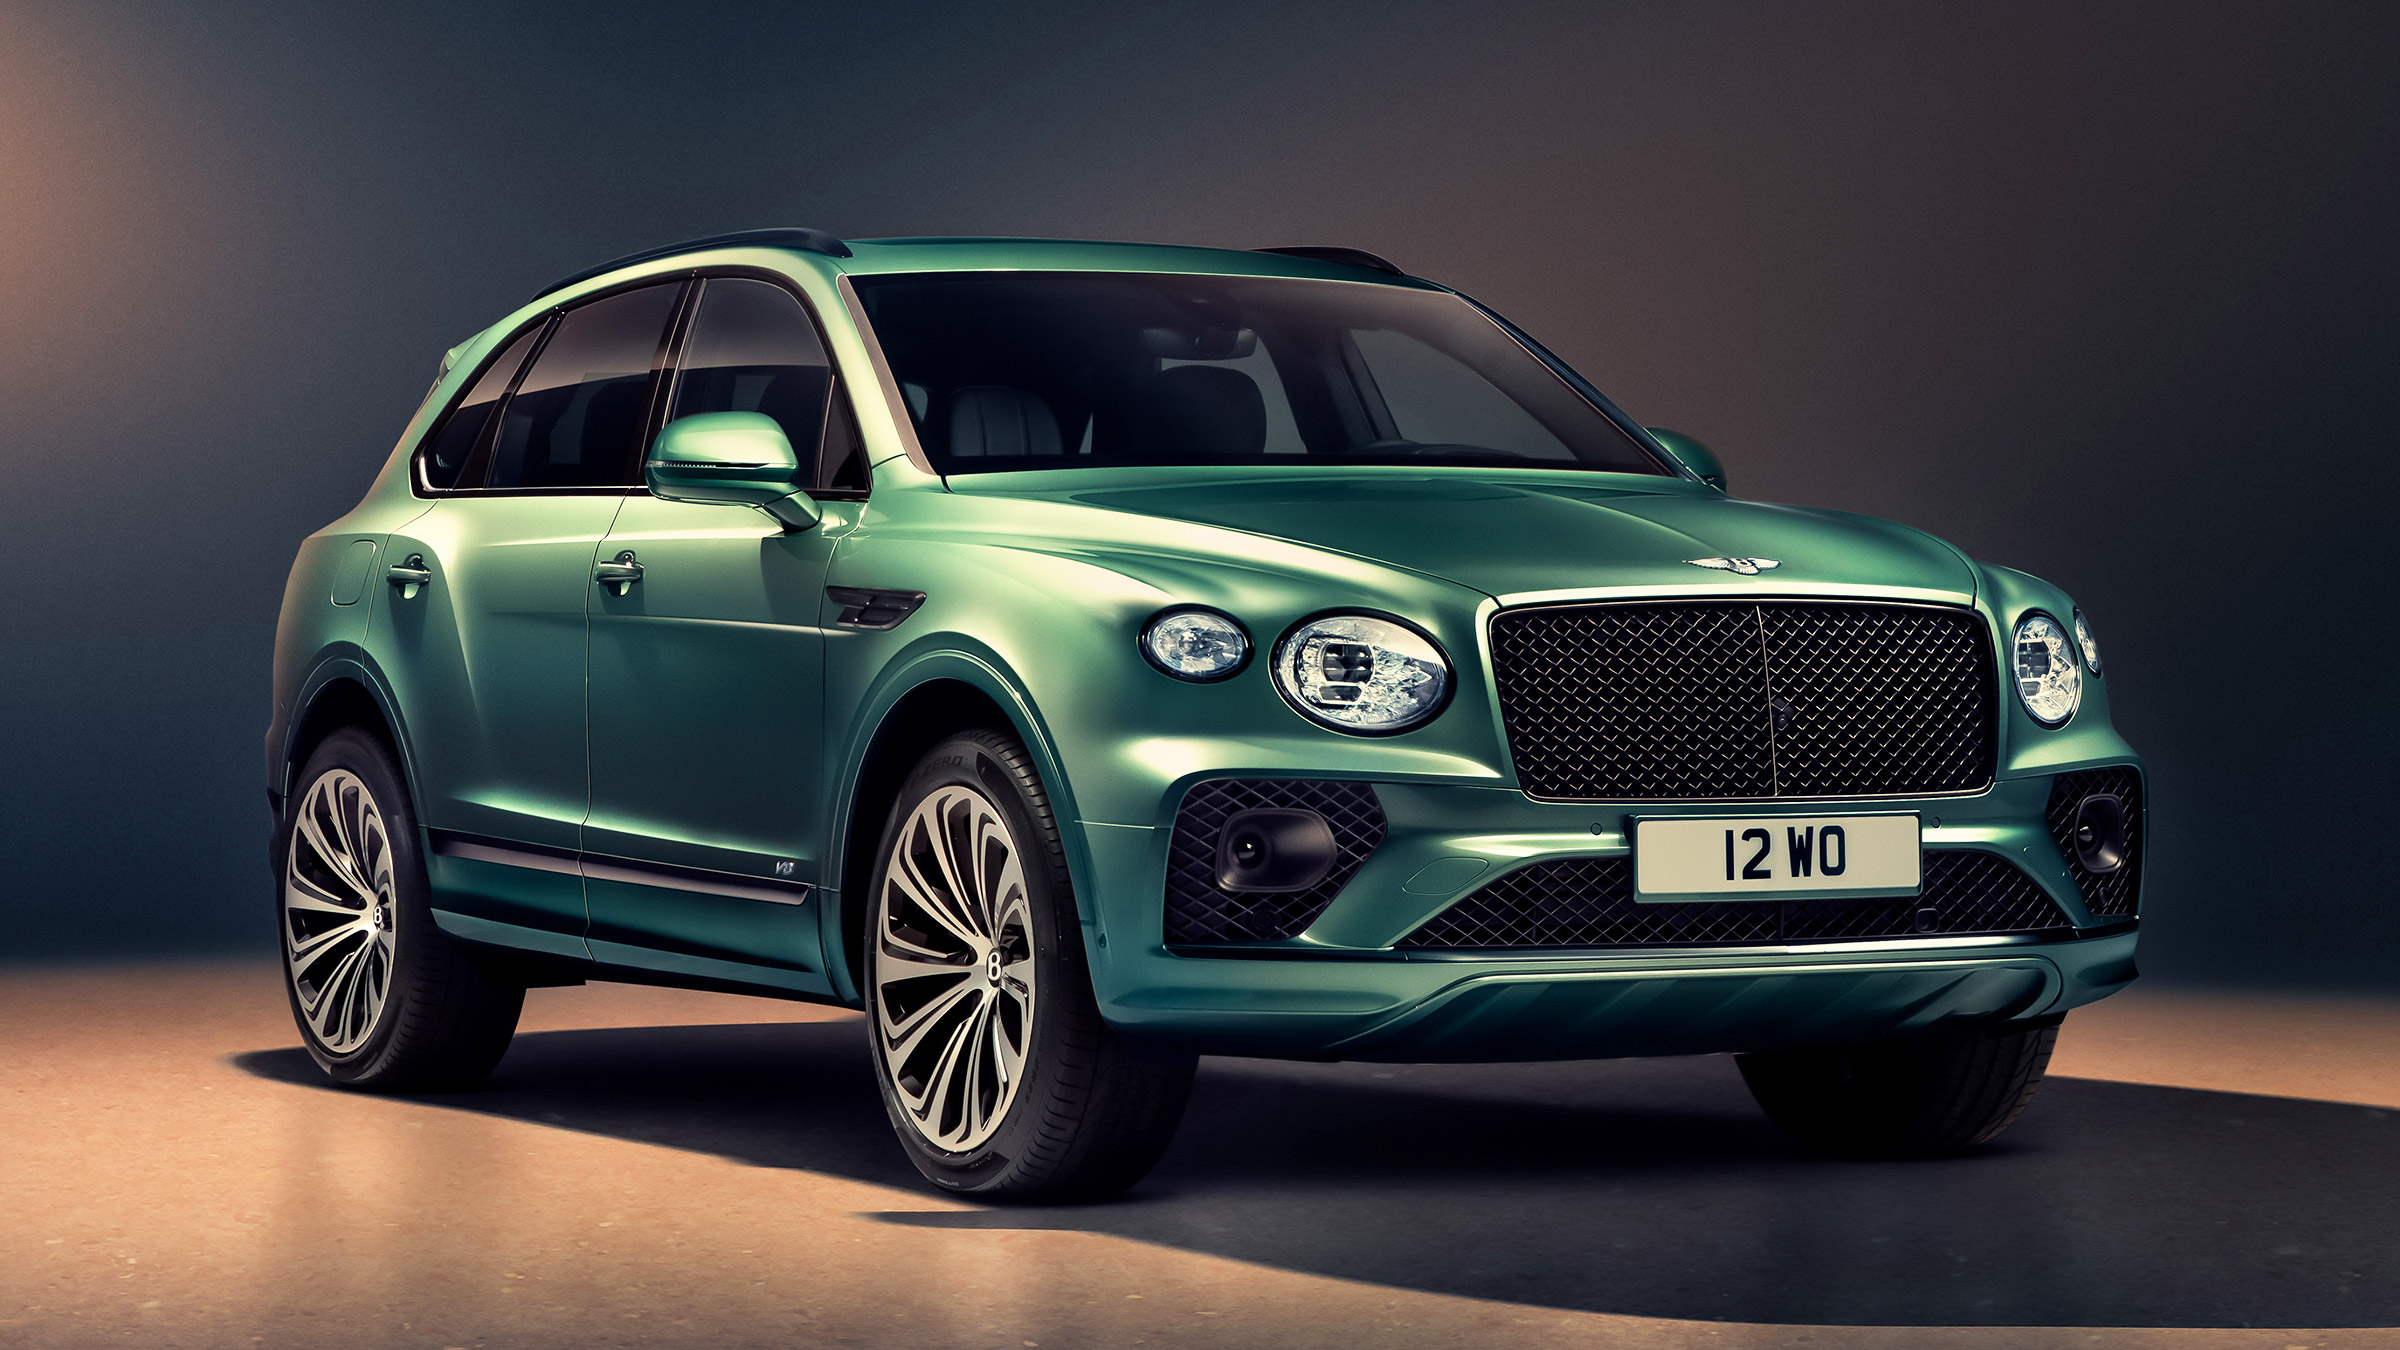 New 2020 Bentley Bentayga unites line-up with radical facelift